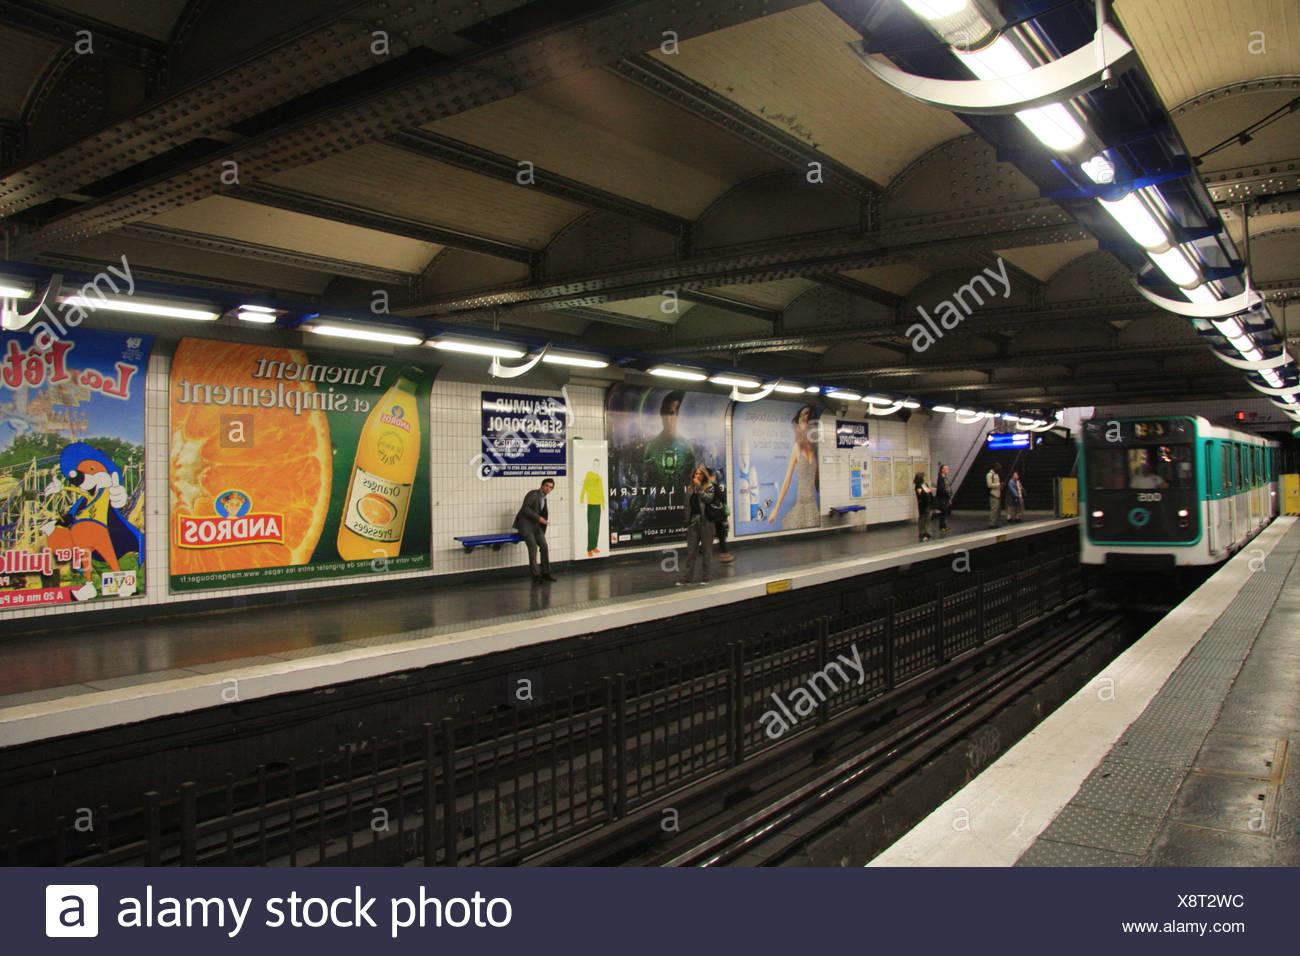 Paris, metro, subway, underground, Reaumur Sebastopol, train, entrance, transport, publicly, - Stock Image